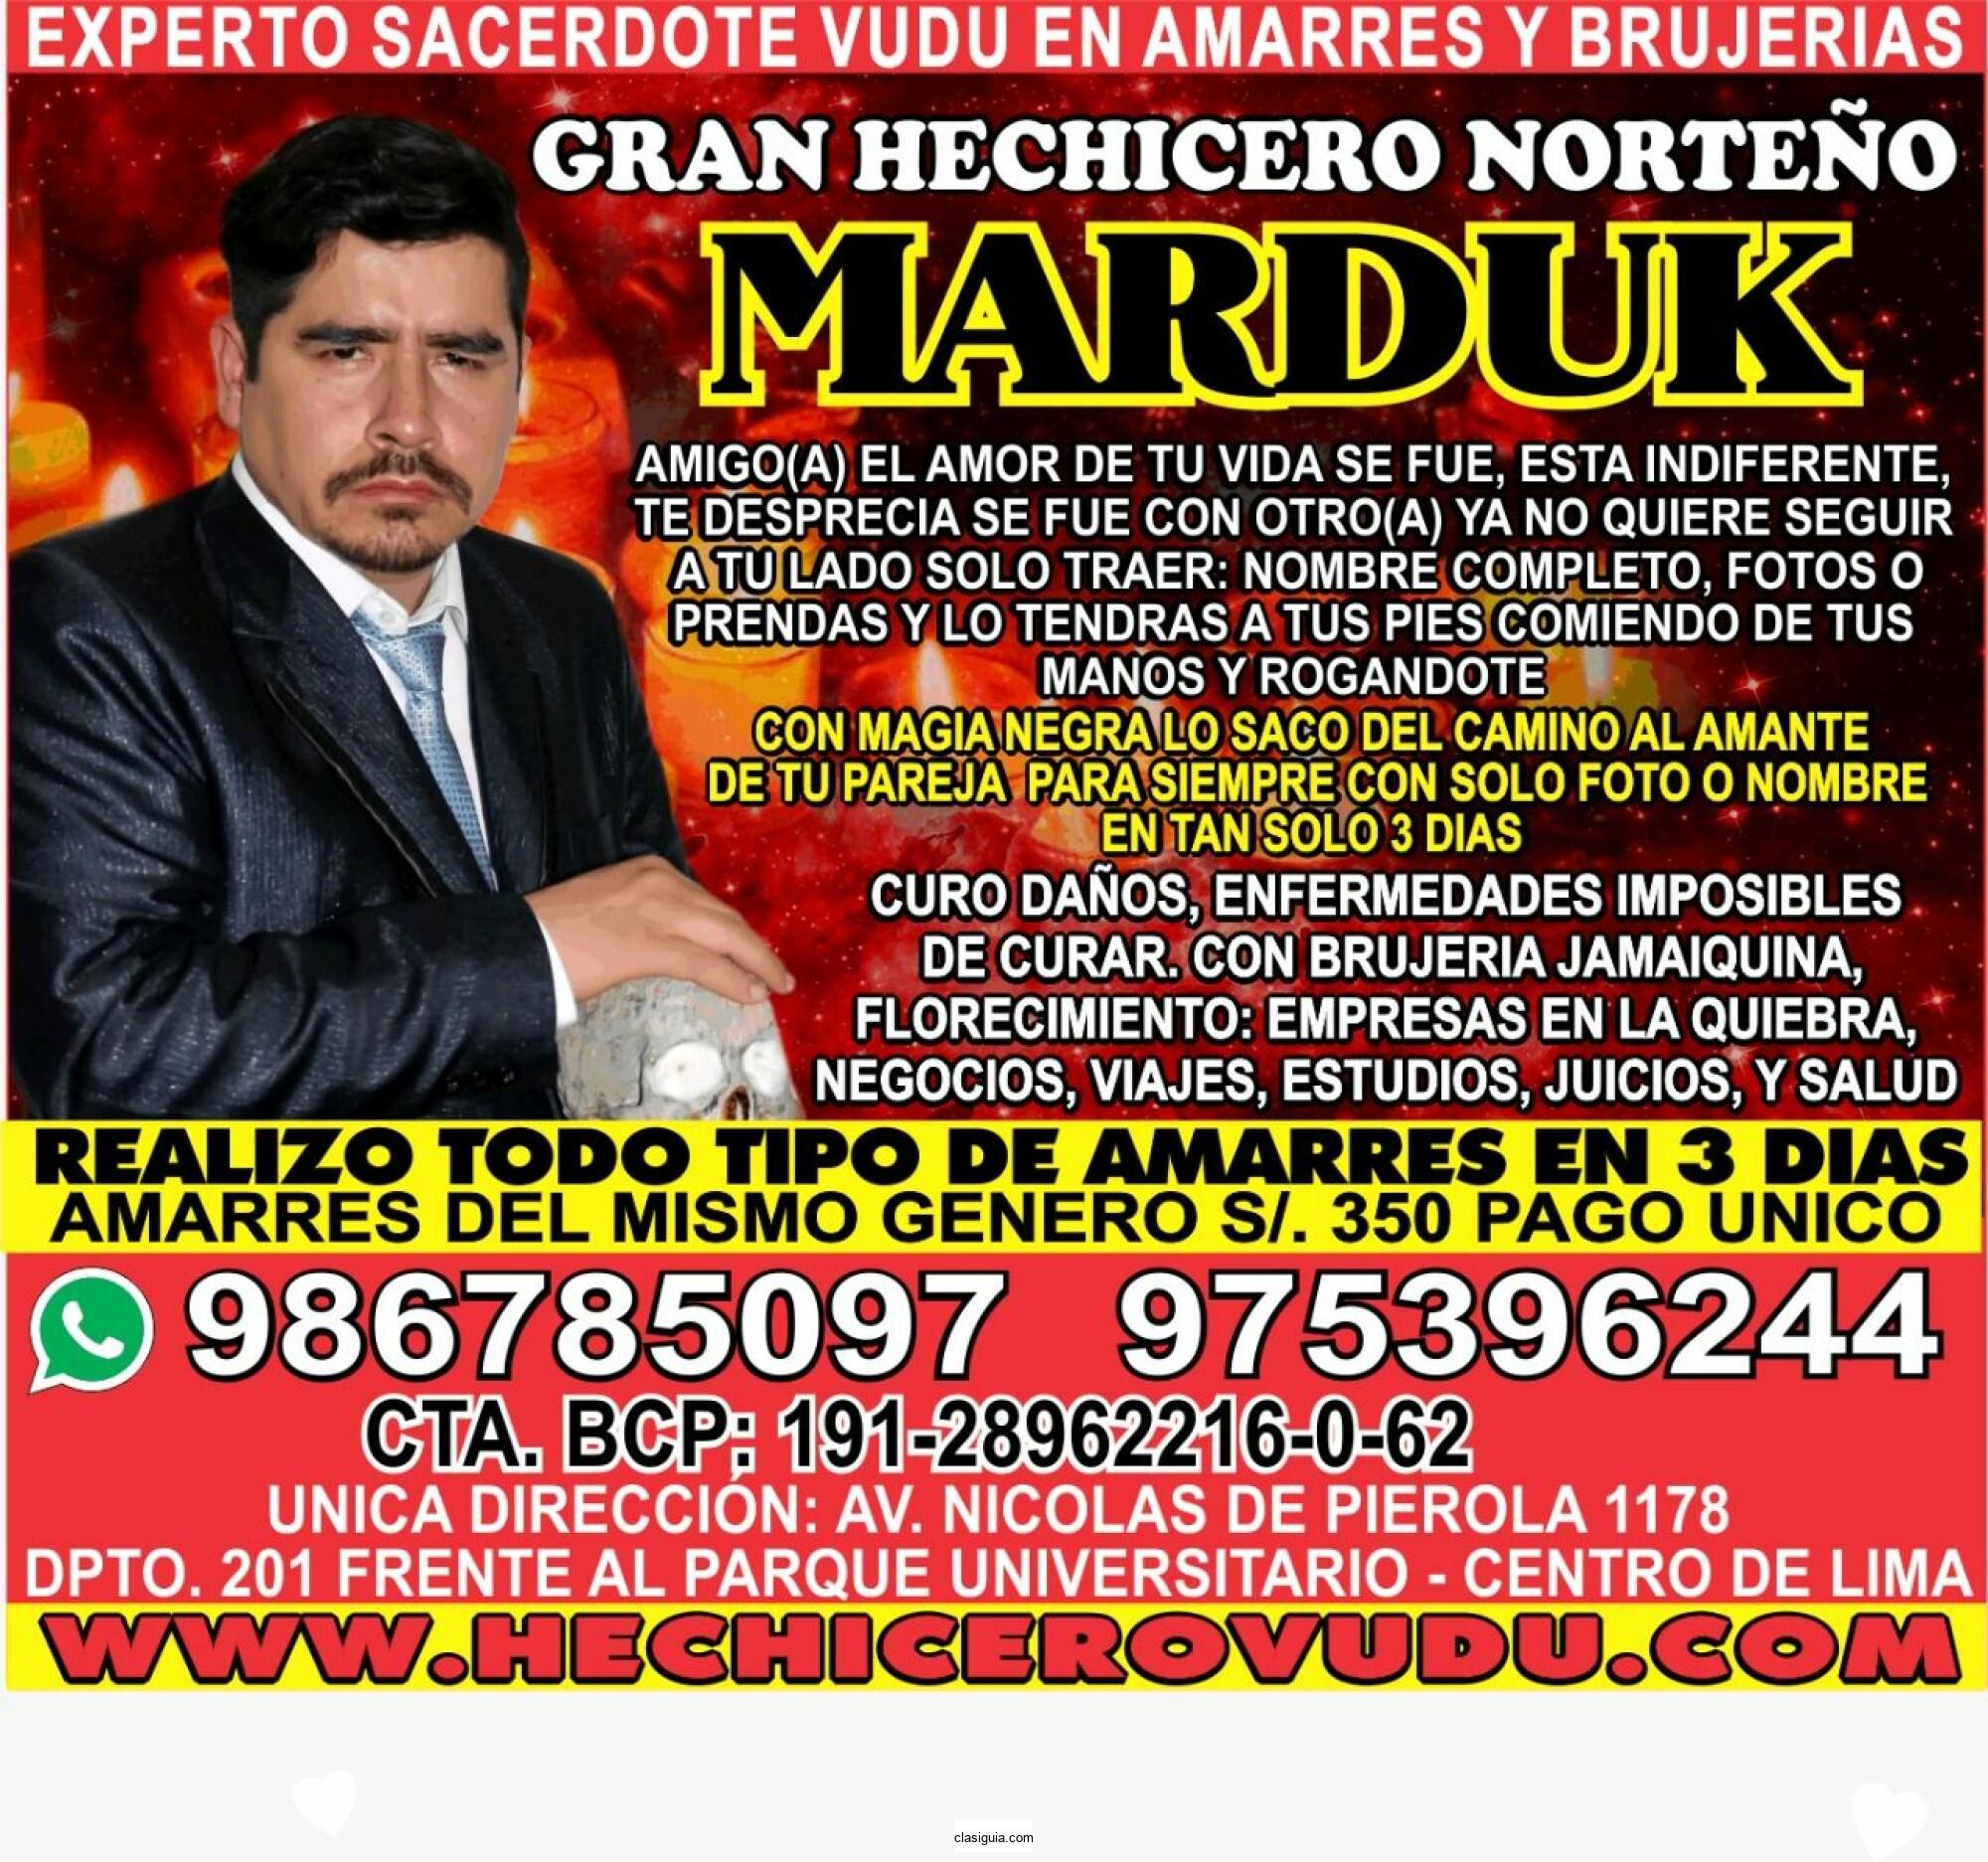 MAESTRO MARDUK SANTERO EN ECUADOR